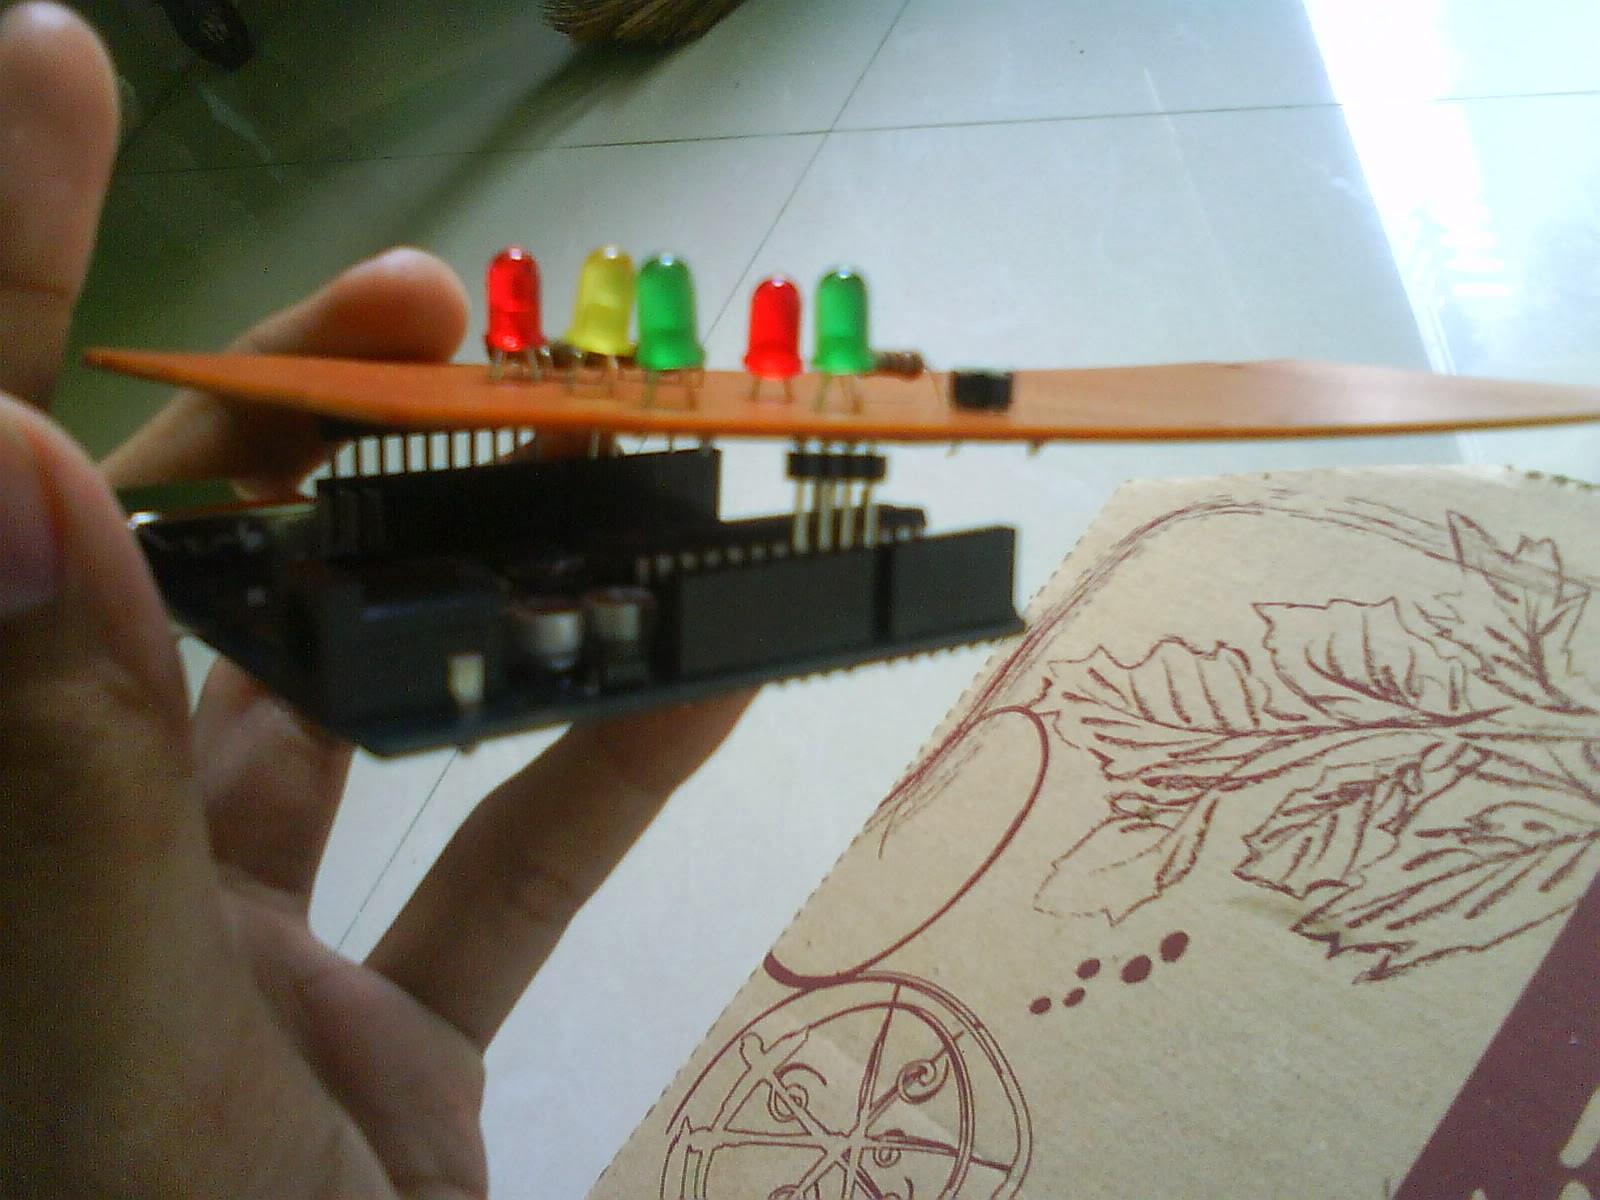 Afada s hobby prototype lampu merah menggunakan arduino uno